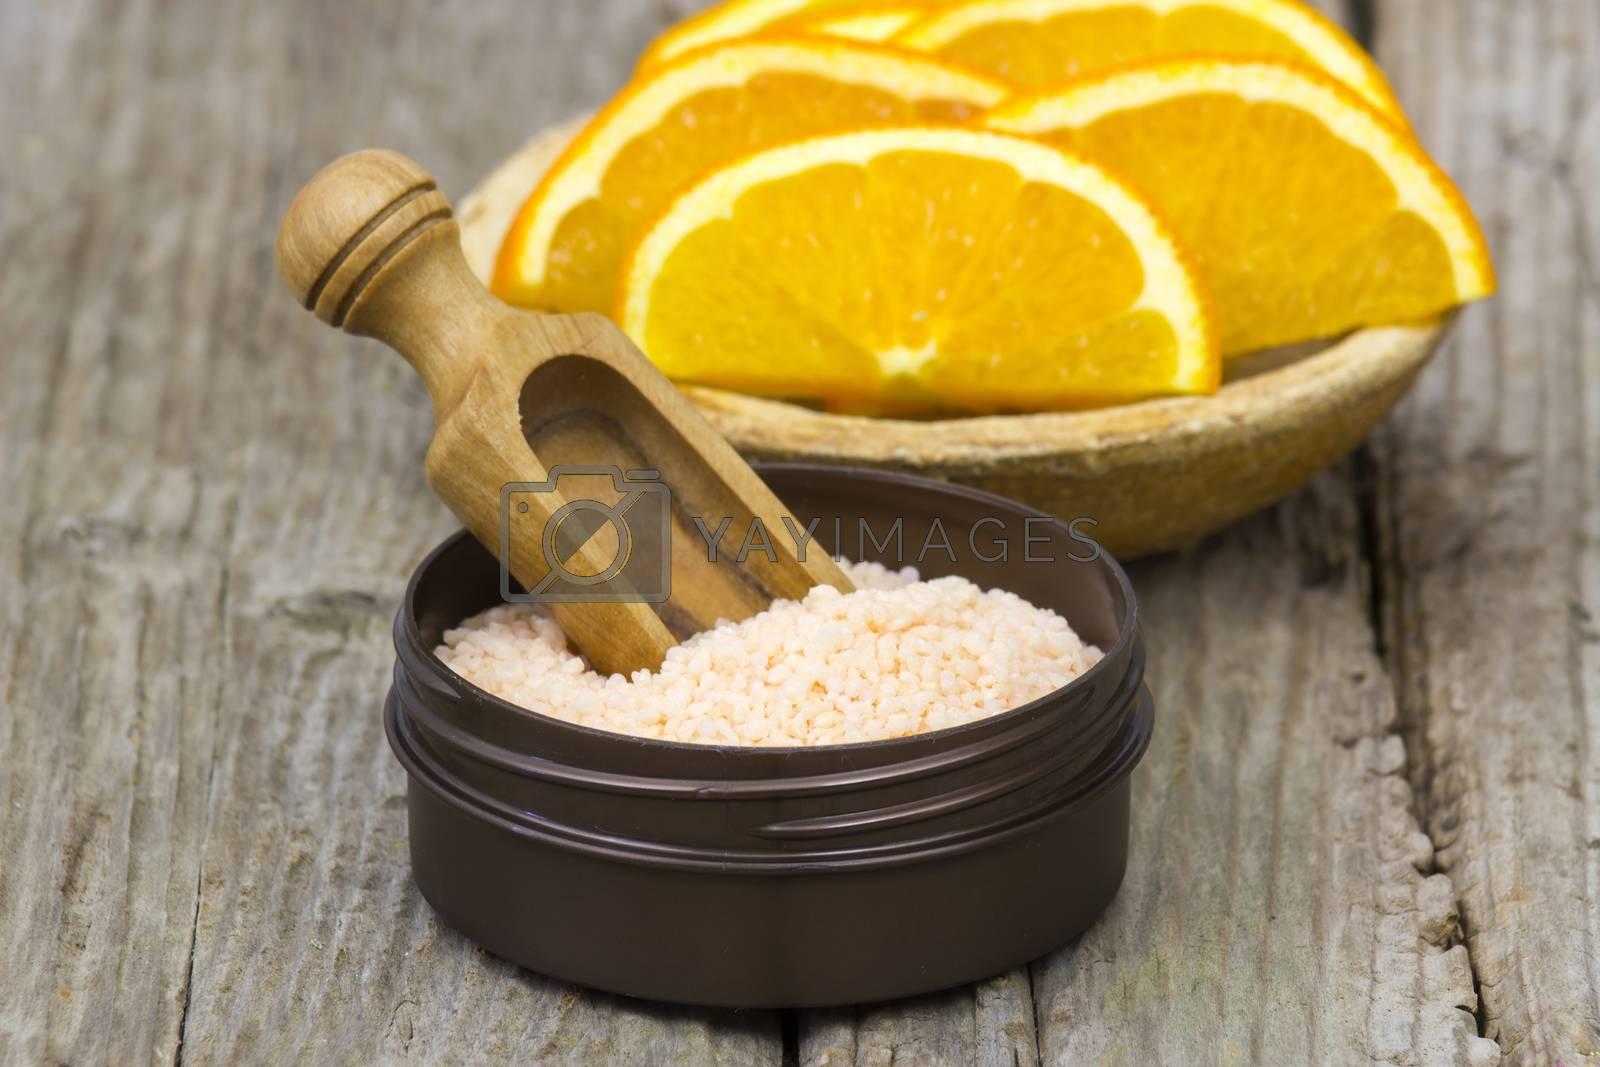 orange bath salt and fresh fruits - beauty treatment